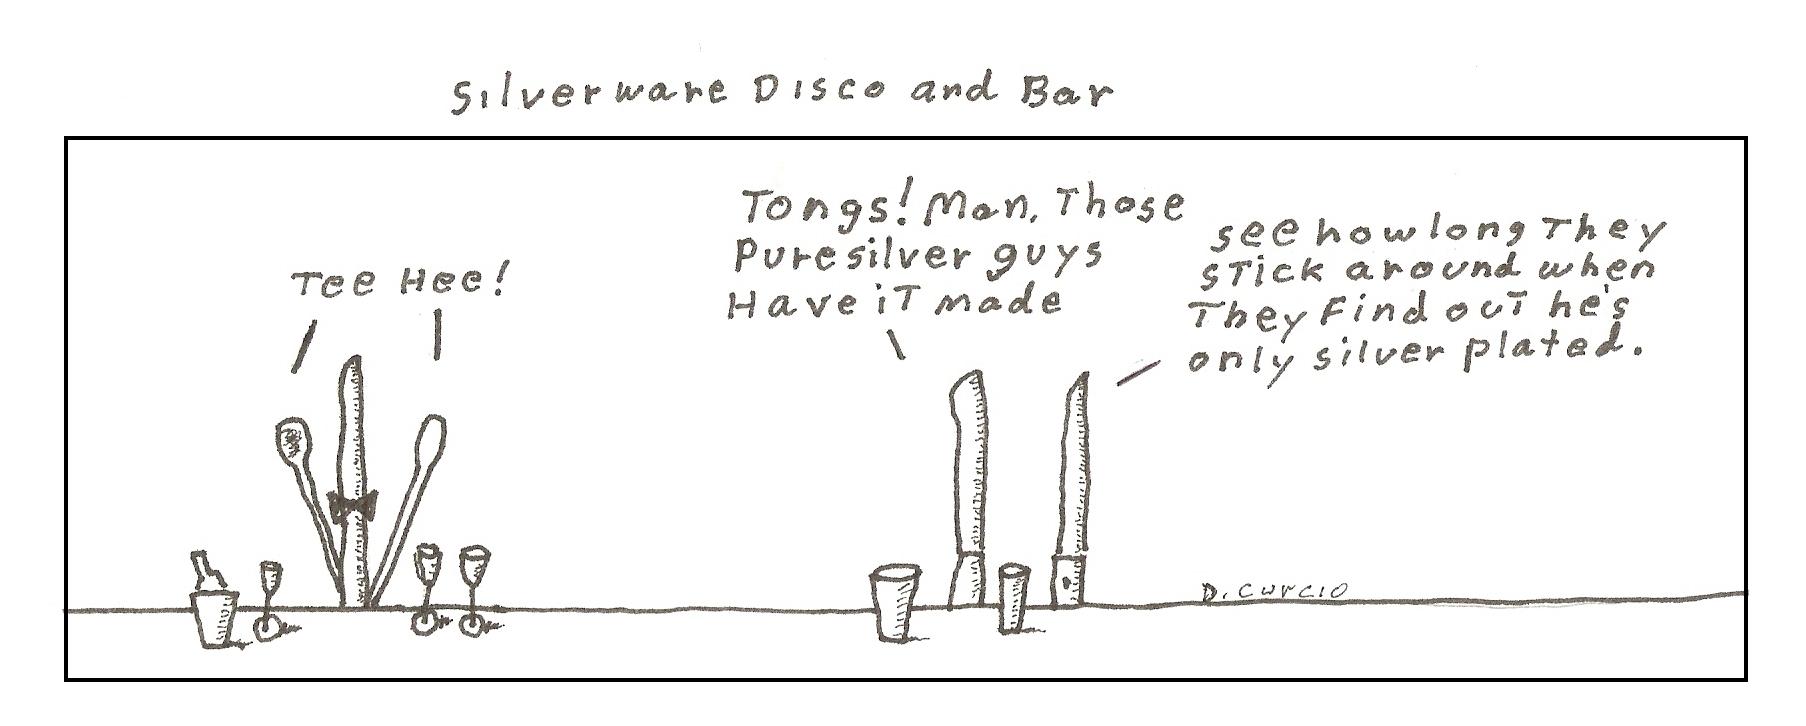 Silverware Disco And Bar 3